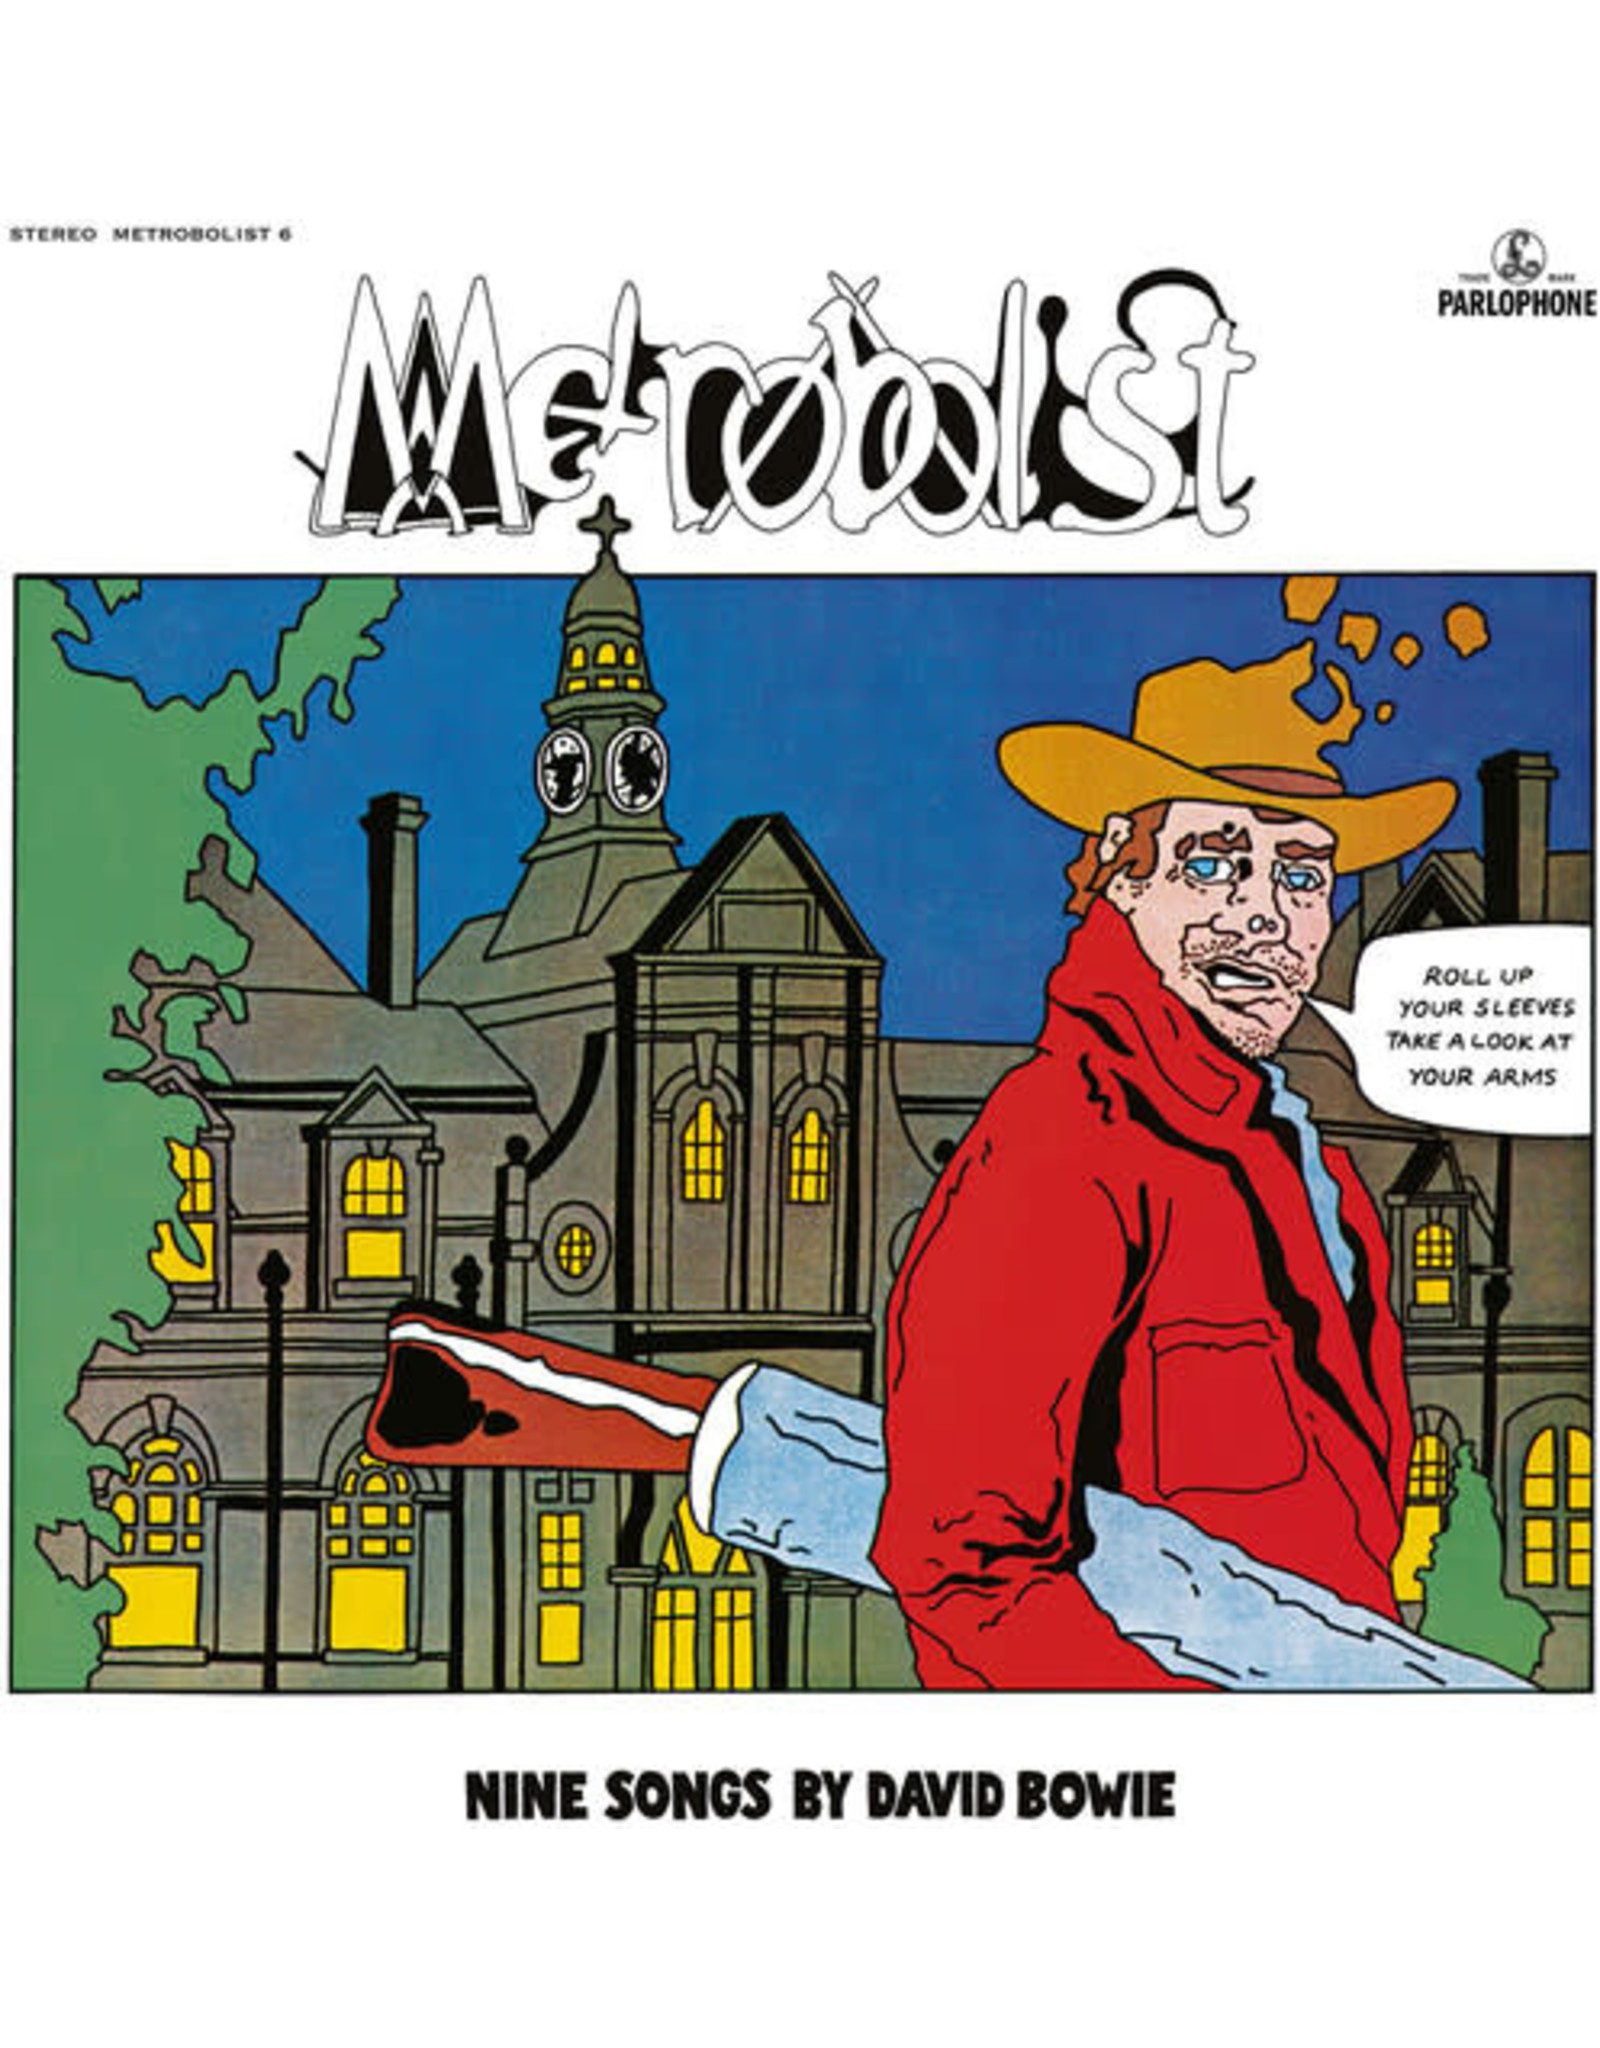 New Vinyl David Bowie - Metrobolist (AKA The Man Who Sold The World) LP